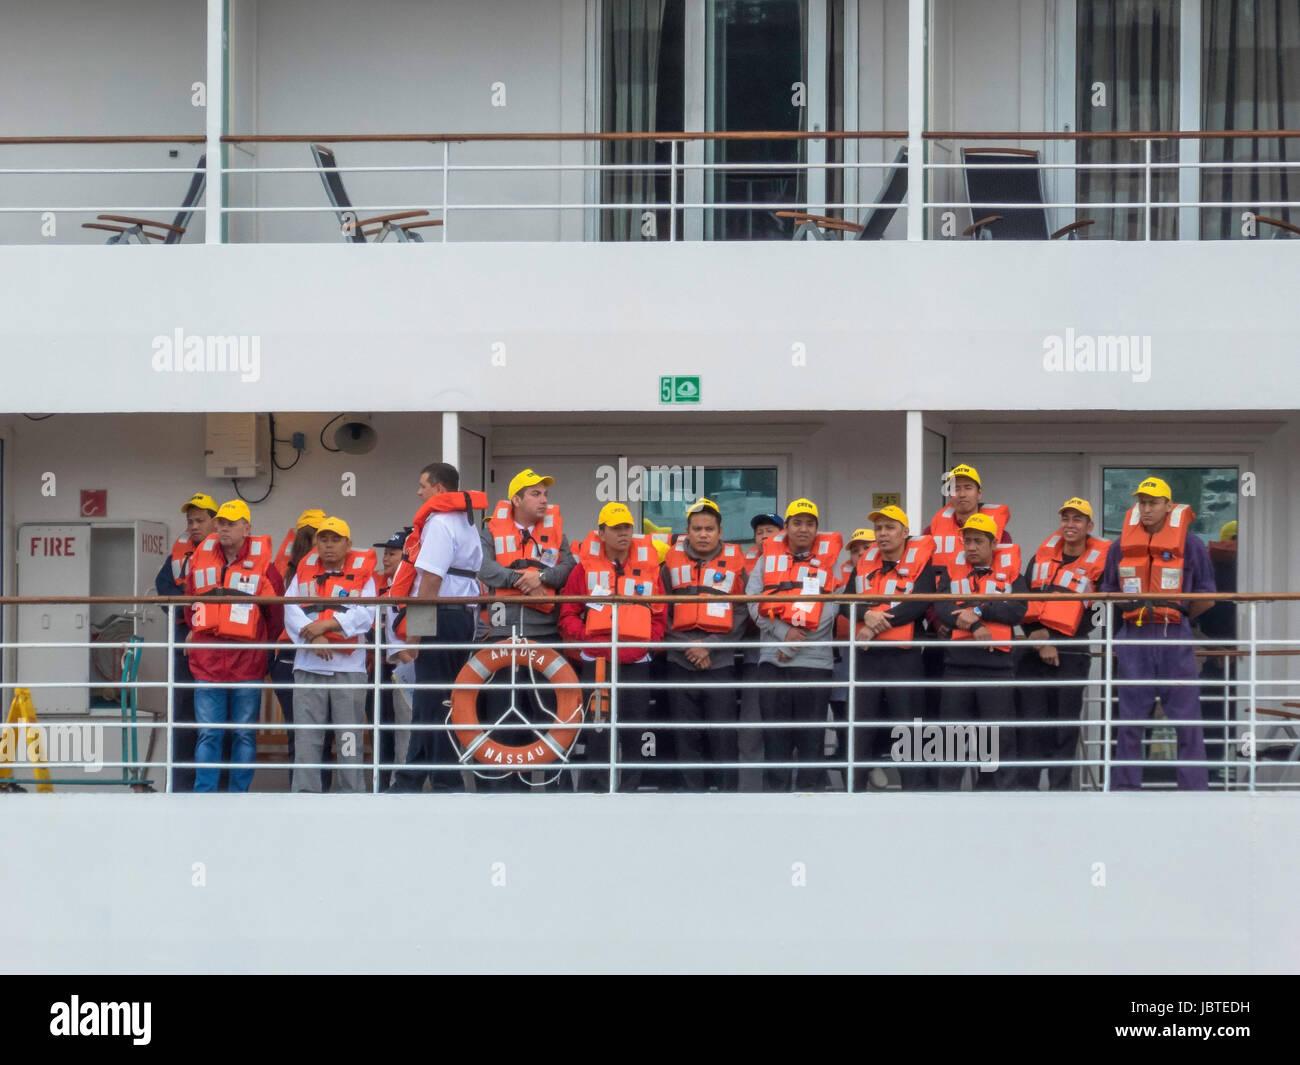 Rettungsübung auf Kreuzfahrtschif Amadea / safety drill on cruiseship Amadea - Stock Image